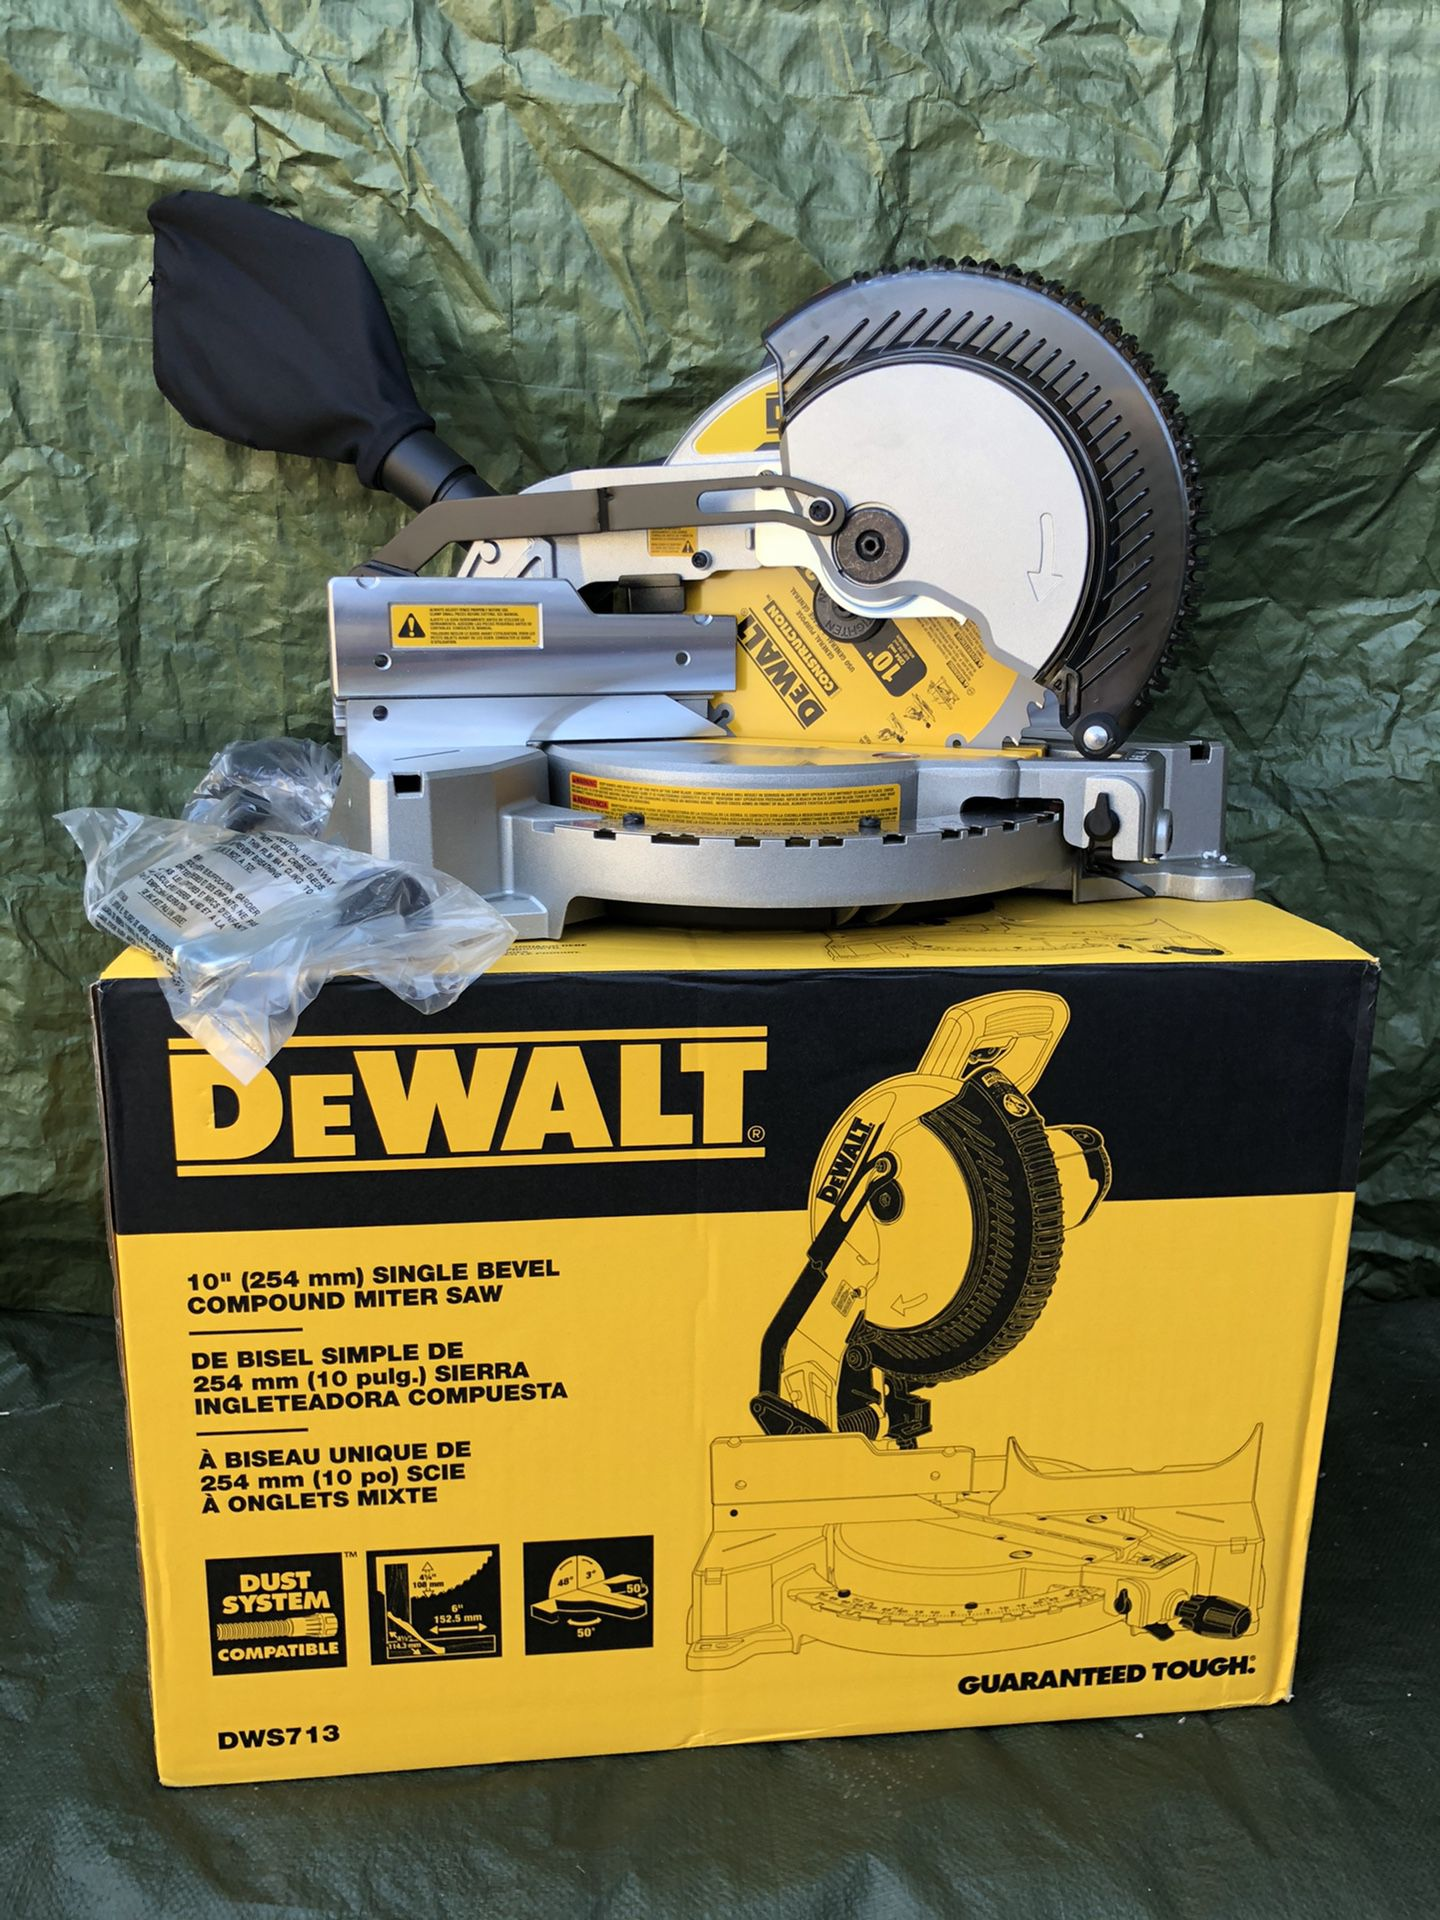 "Dewalt Singe 10"" Double Single Compound Miter Saw"